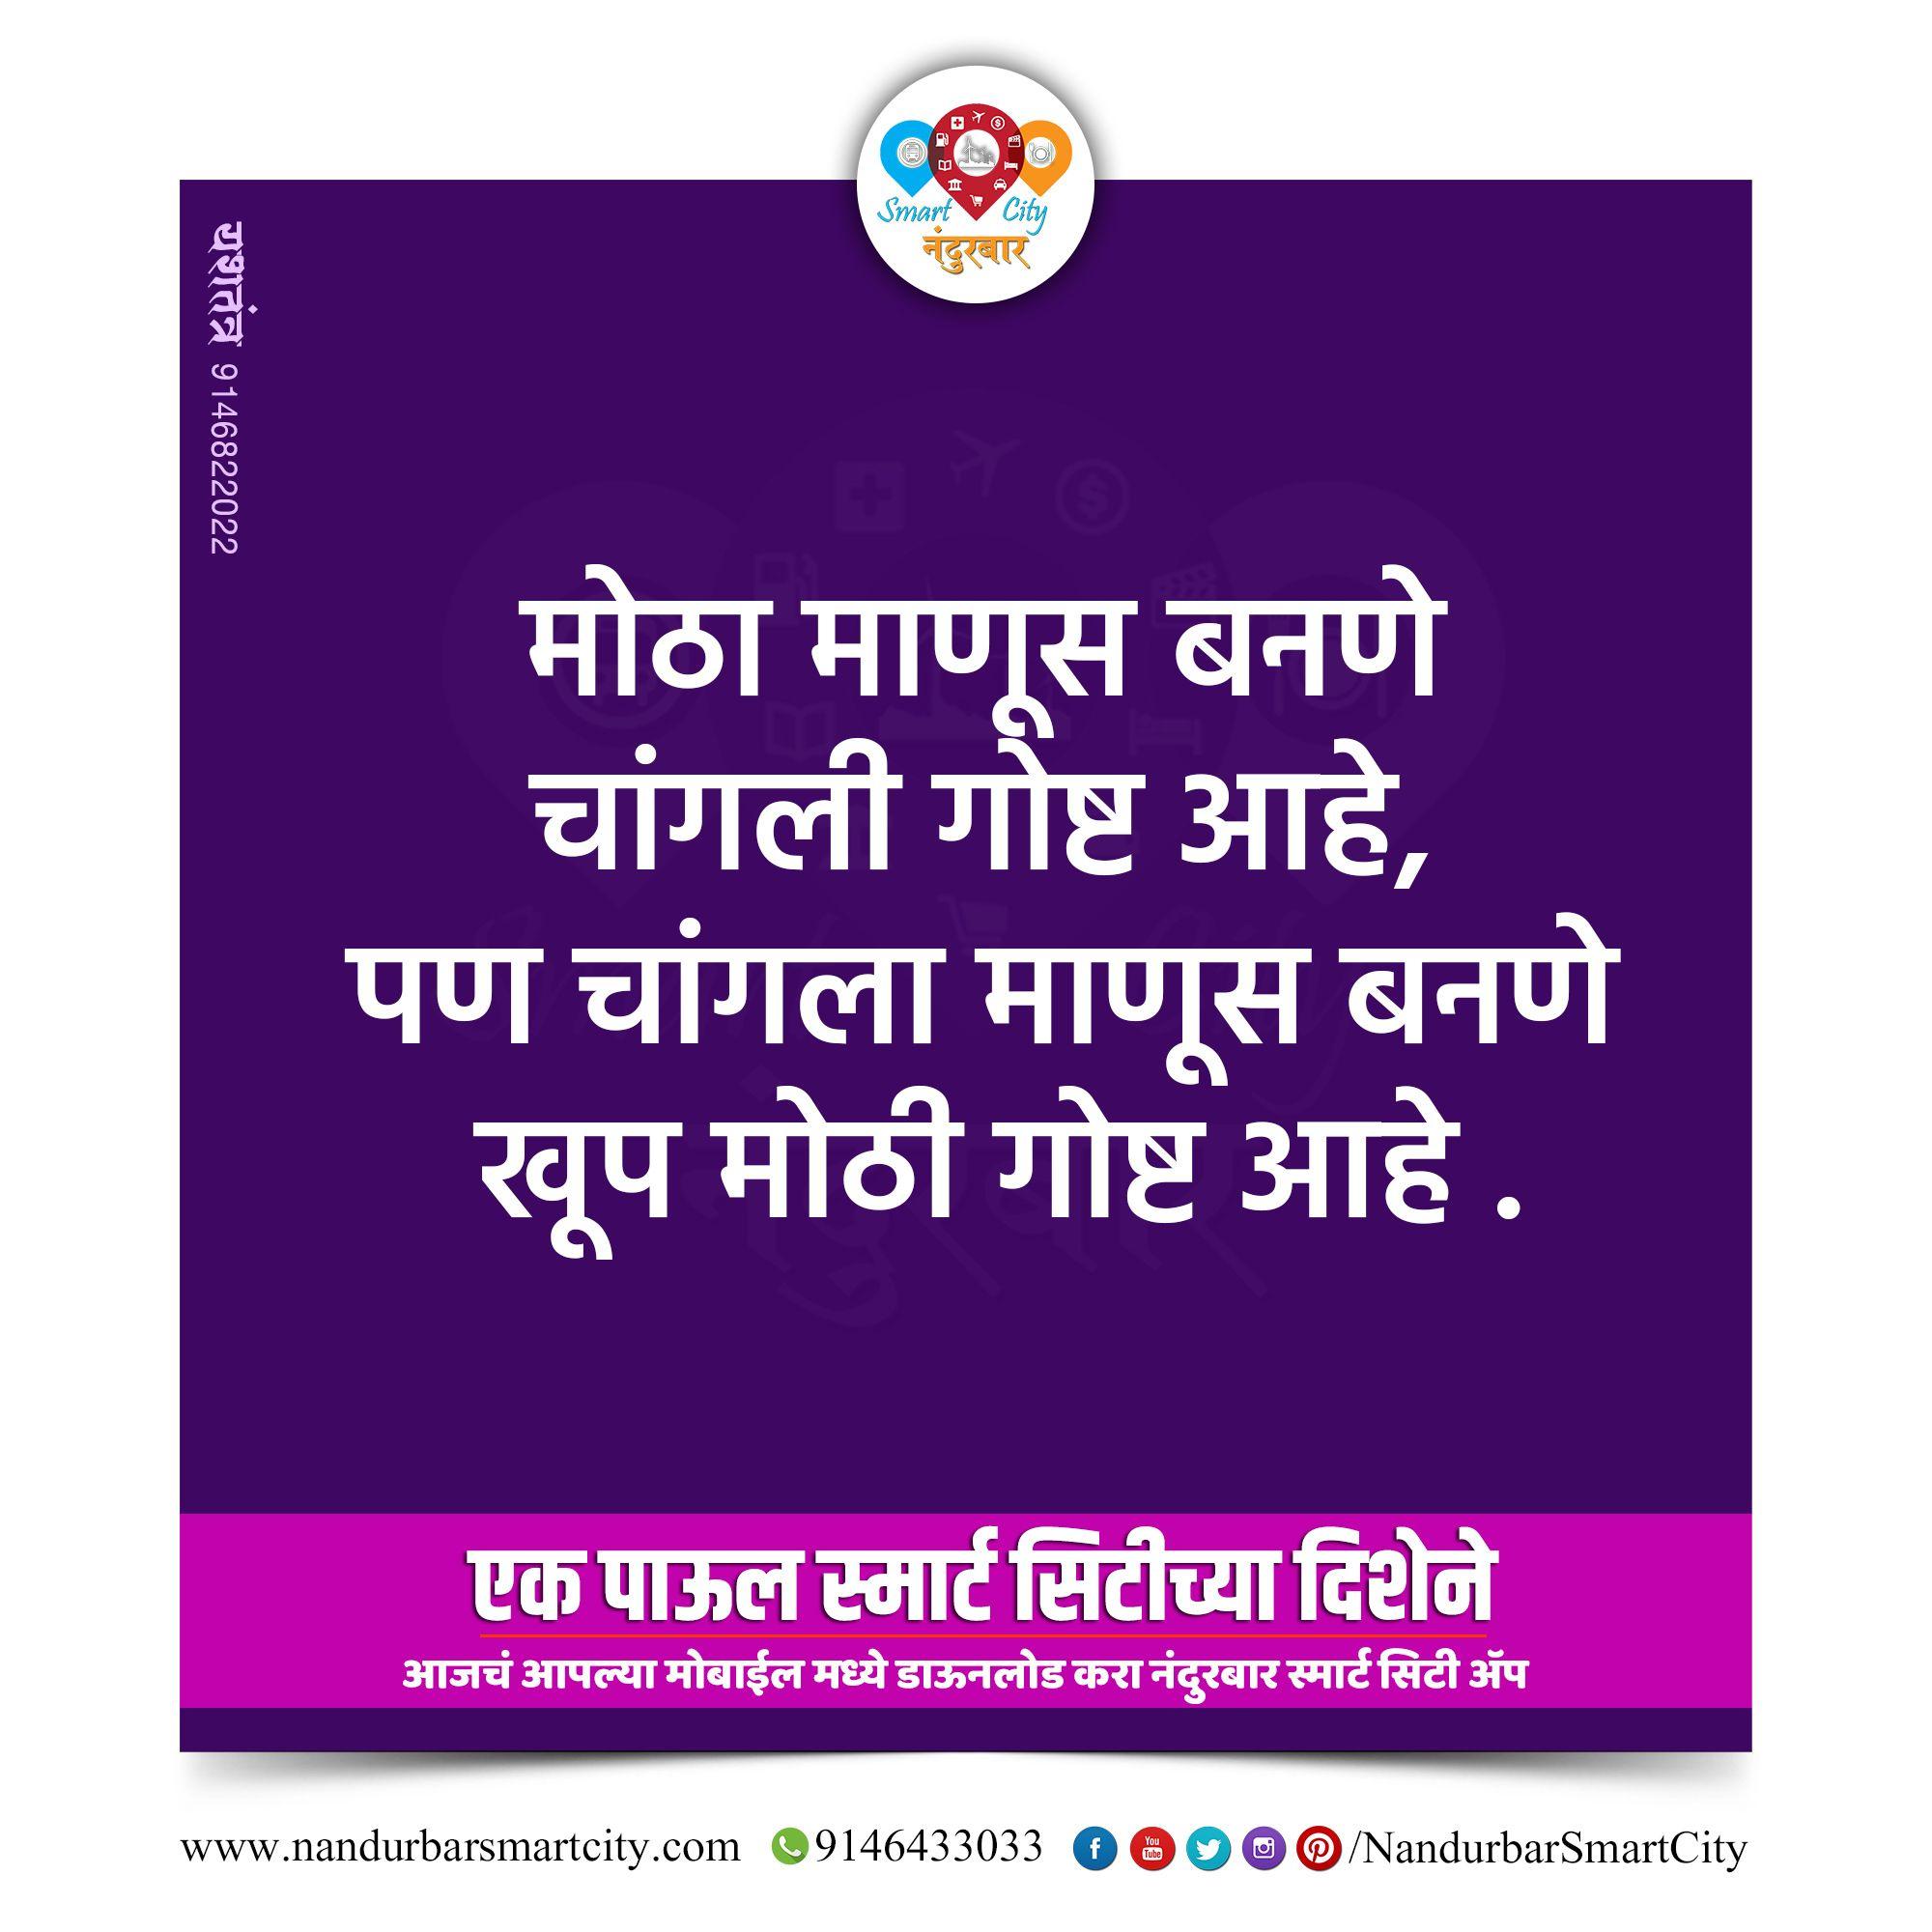 Http Www Nandurbarsmartcity Com All Quotes Nandurbar App